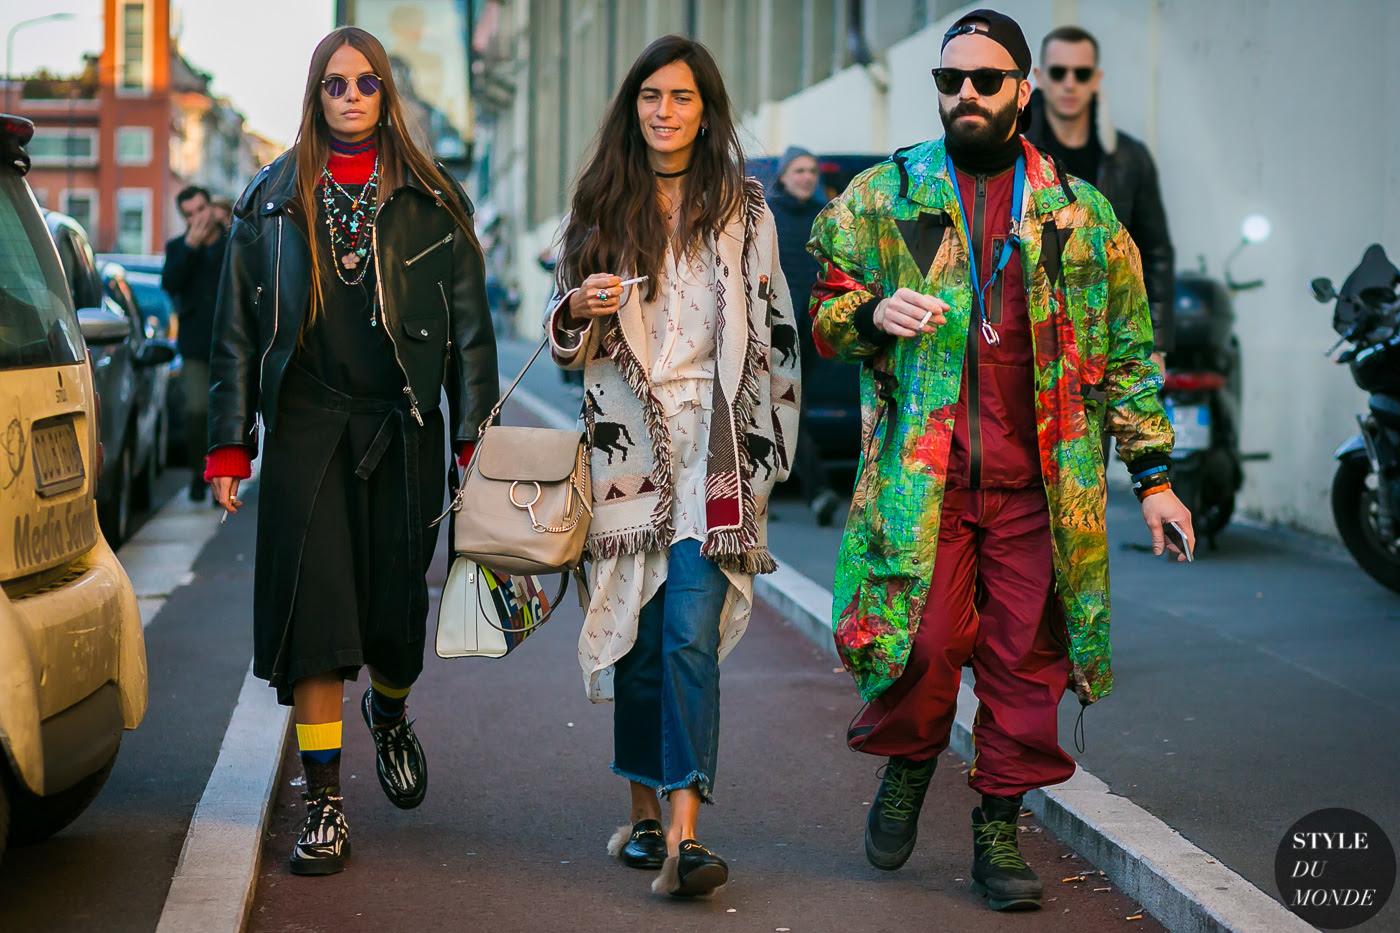 http://www.styledumonde.com/wp-content/uploads/2017/01/Carlotta-Oddi-Chiara-Totire-Satoshi-Klein-by-STYLEDUMONDE-Street-Style-Fashion-Photography0E2A4229-700x467@2x.jpg